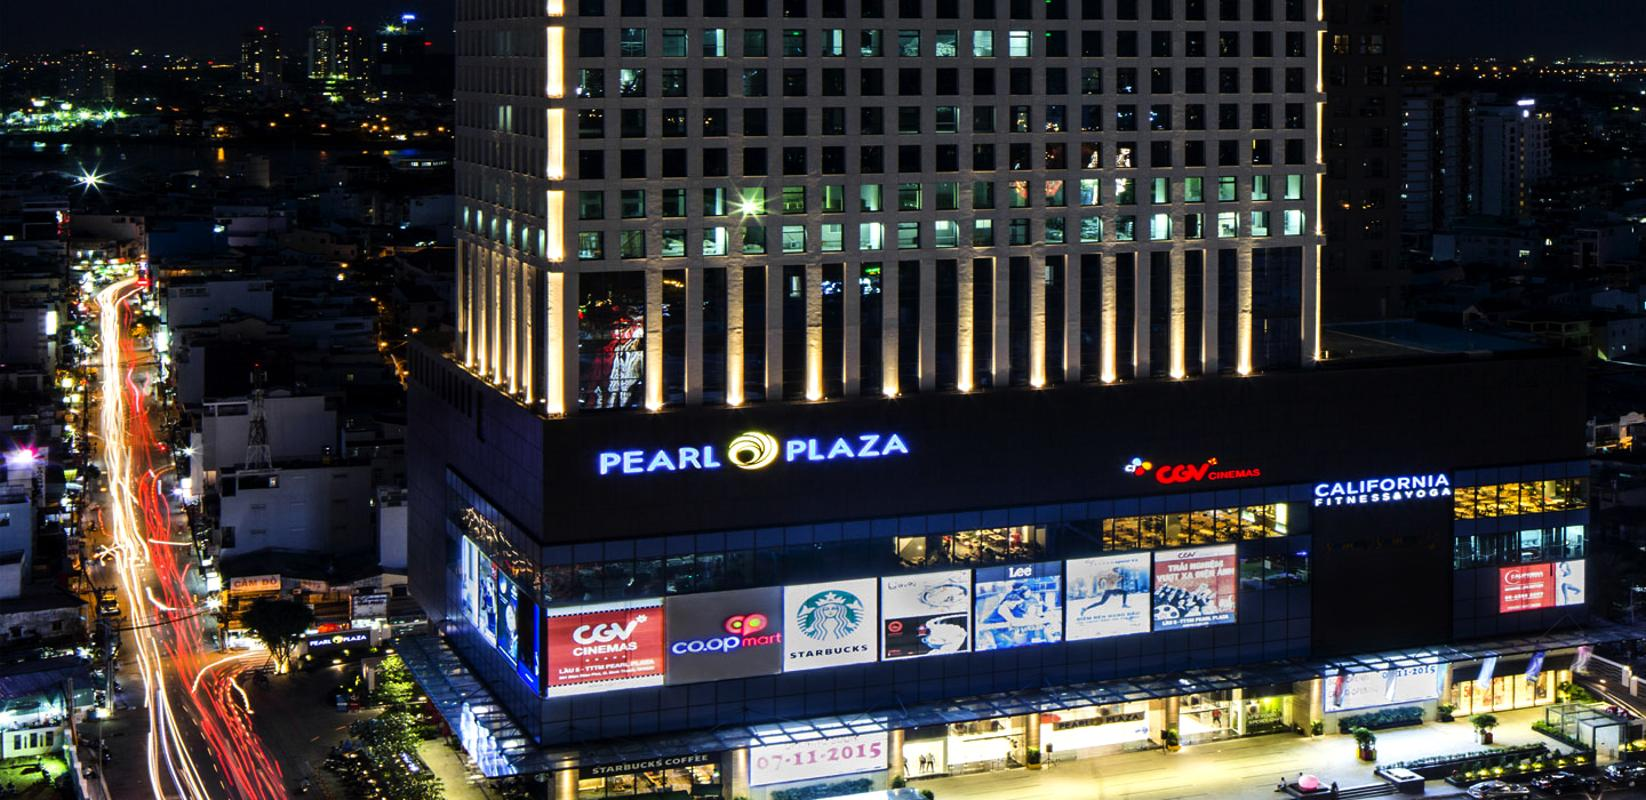 Căn hộ tầng cao Pearl Plaza